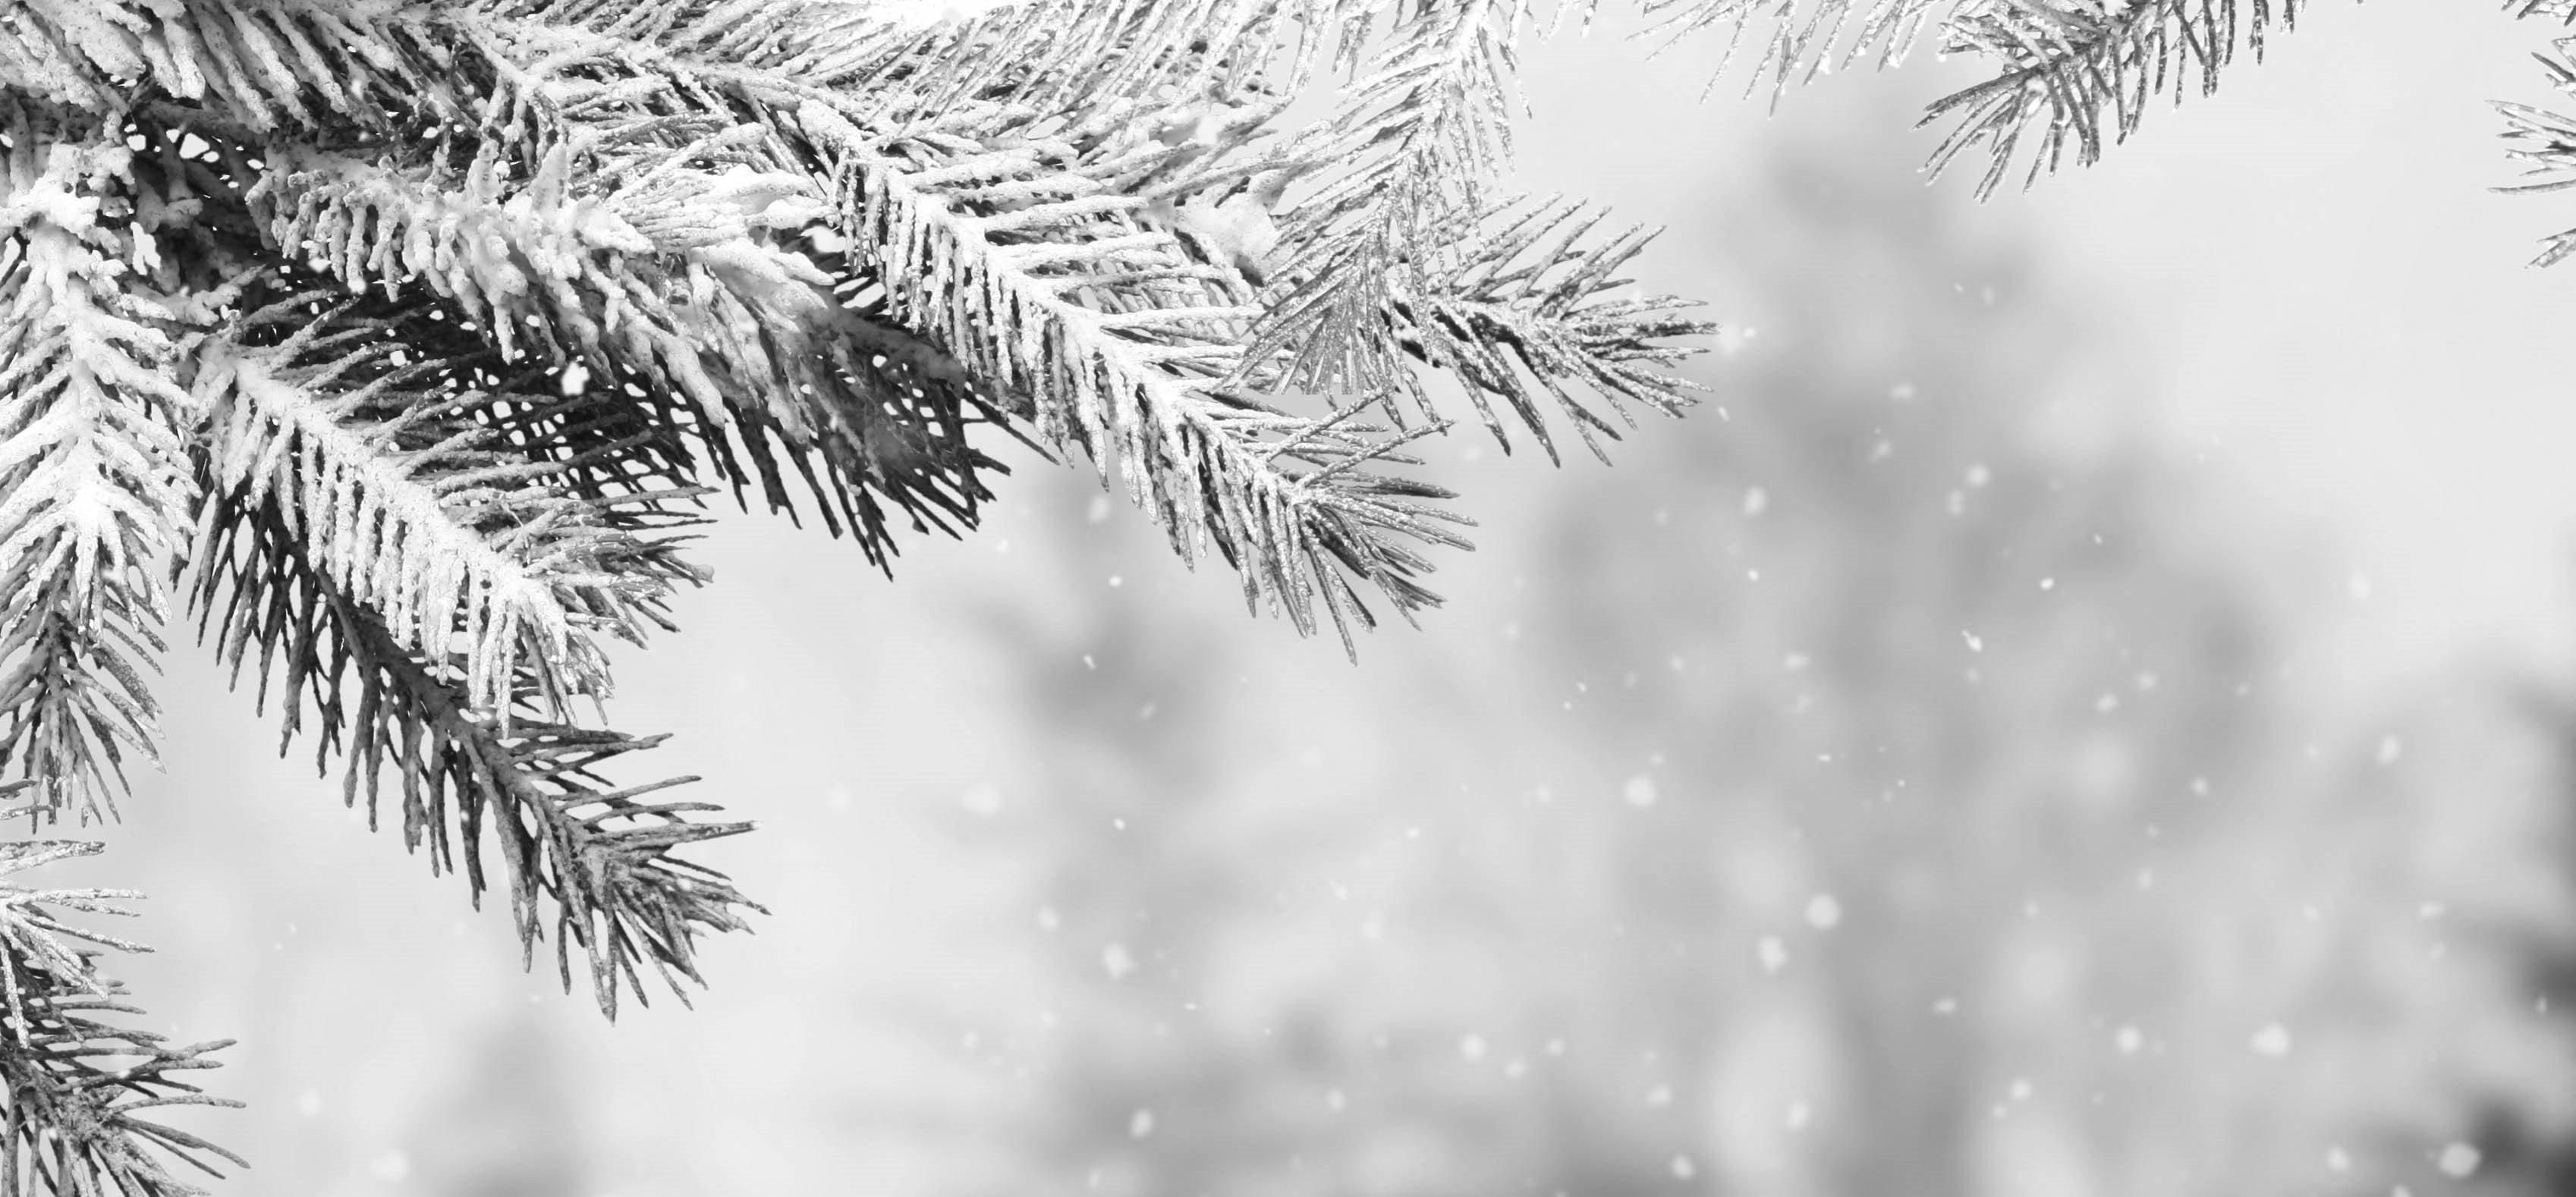 Stock image-winter